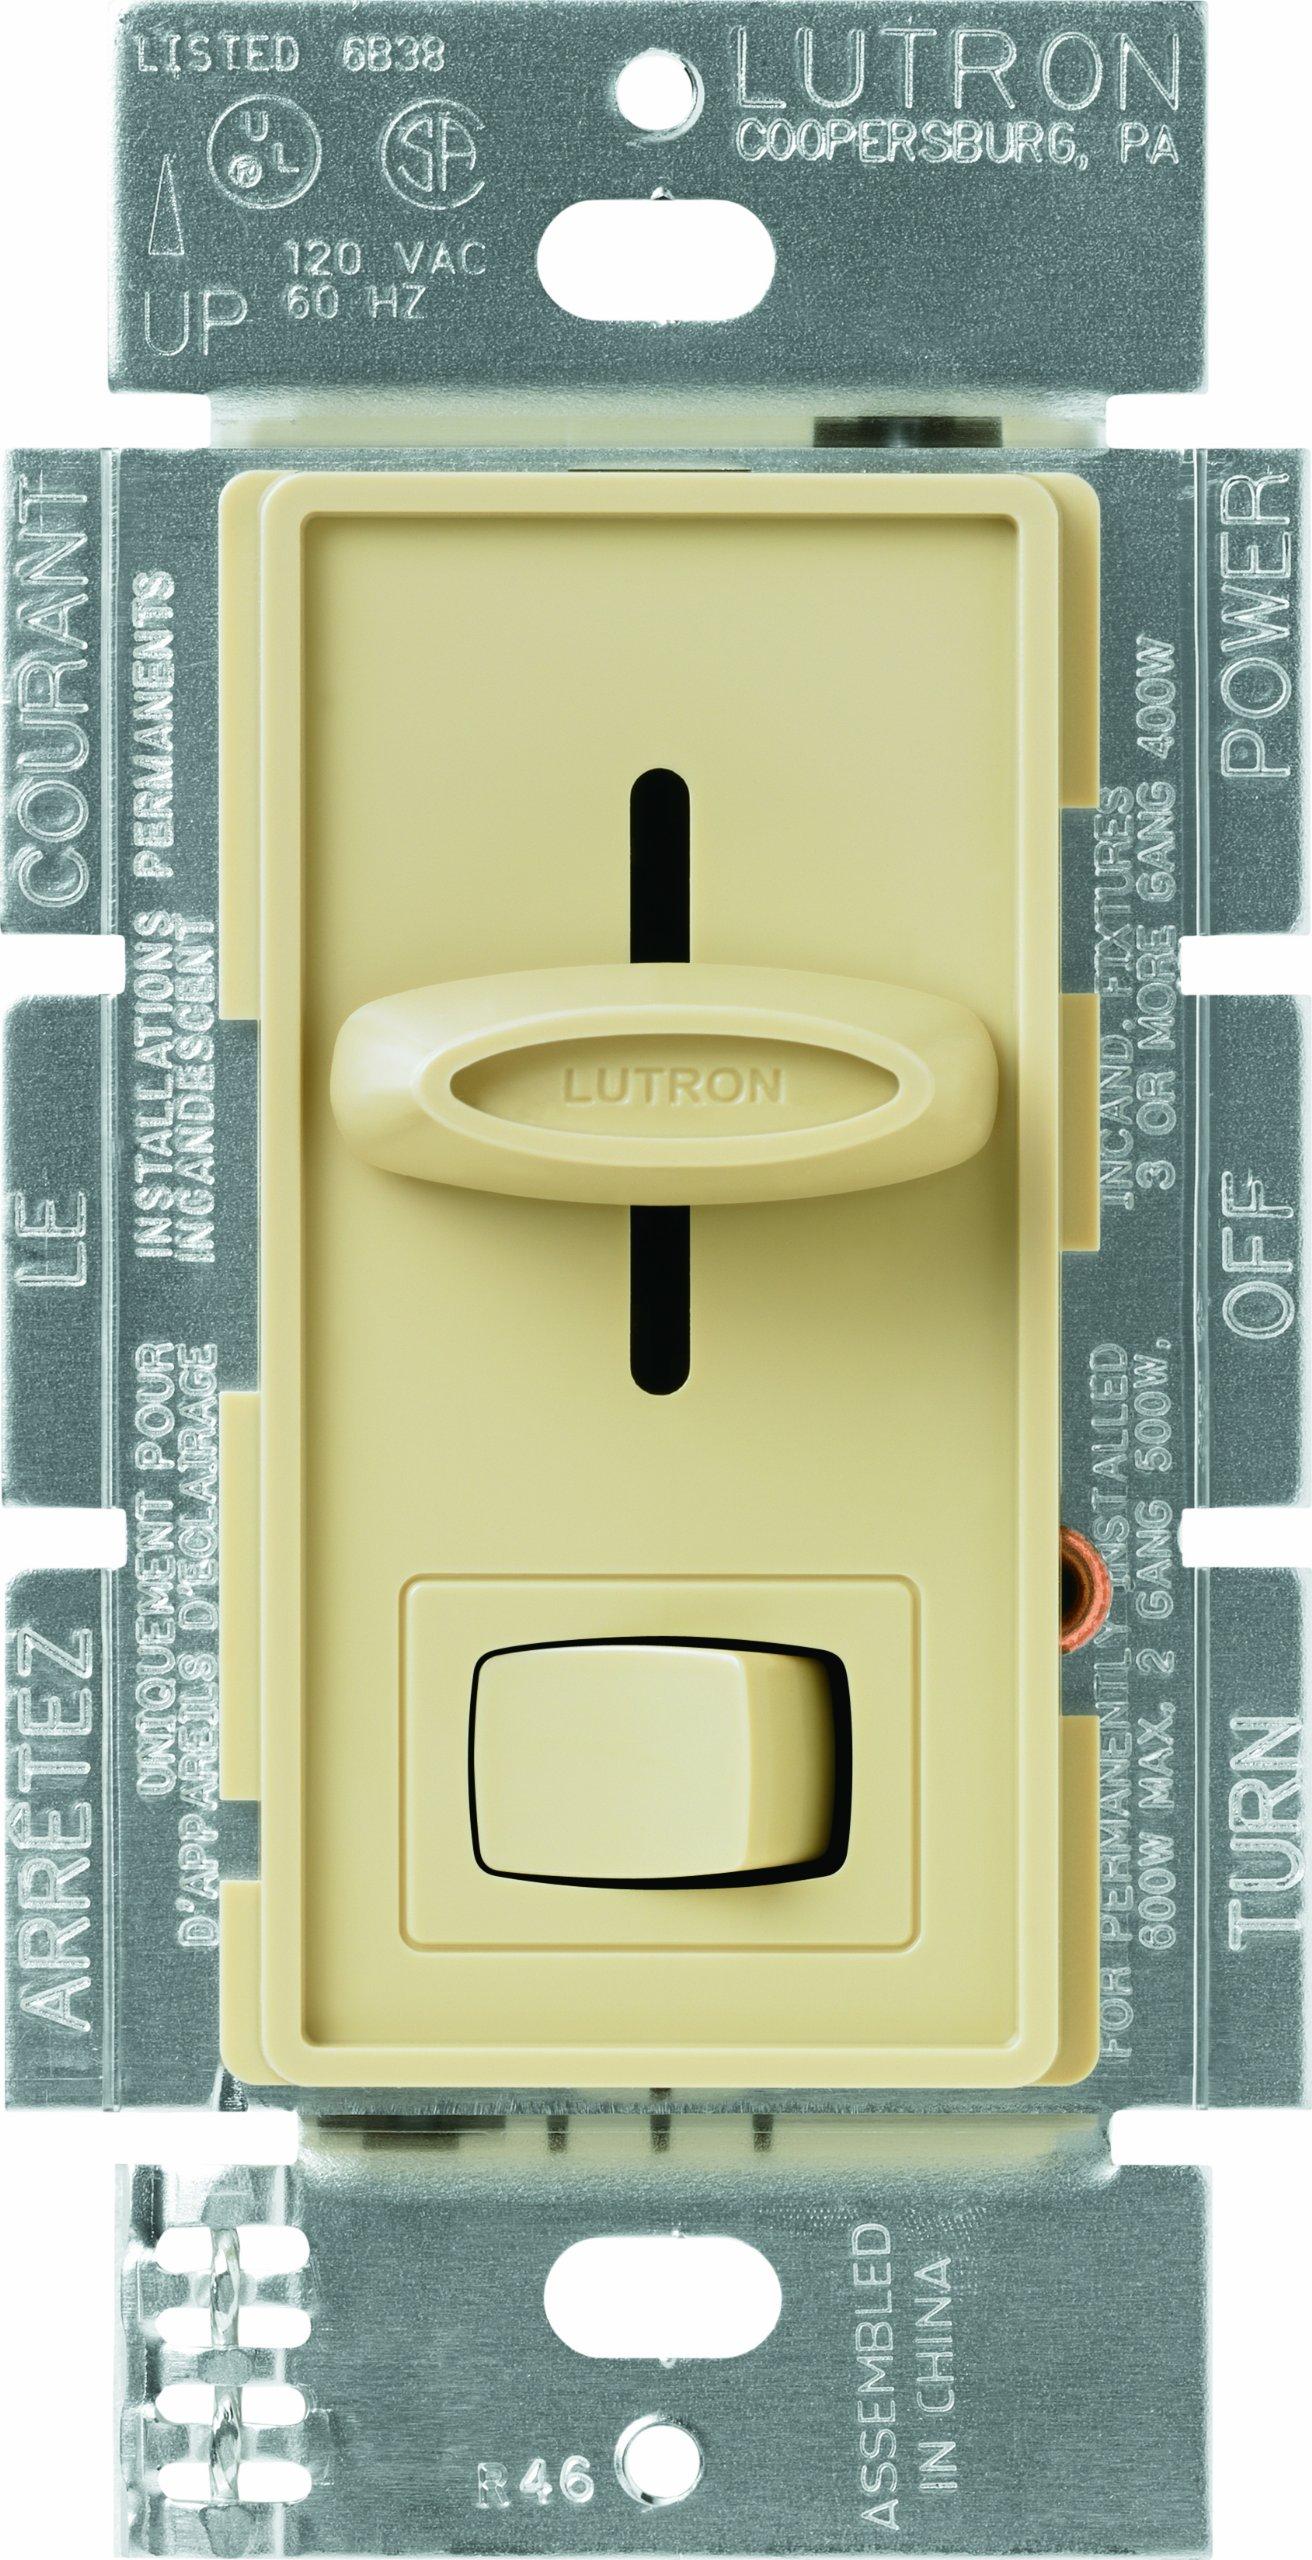 Lutron S-600P-IV Skylark Single Pole Dimmer with On/Off Switch, 600-watt, Ivory